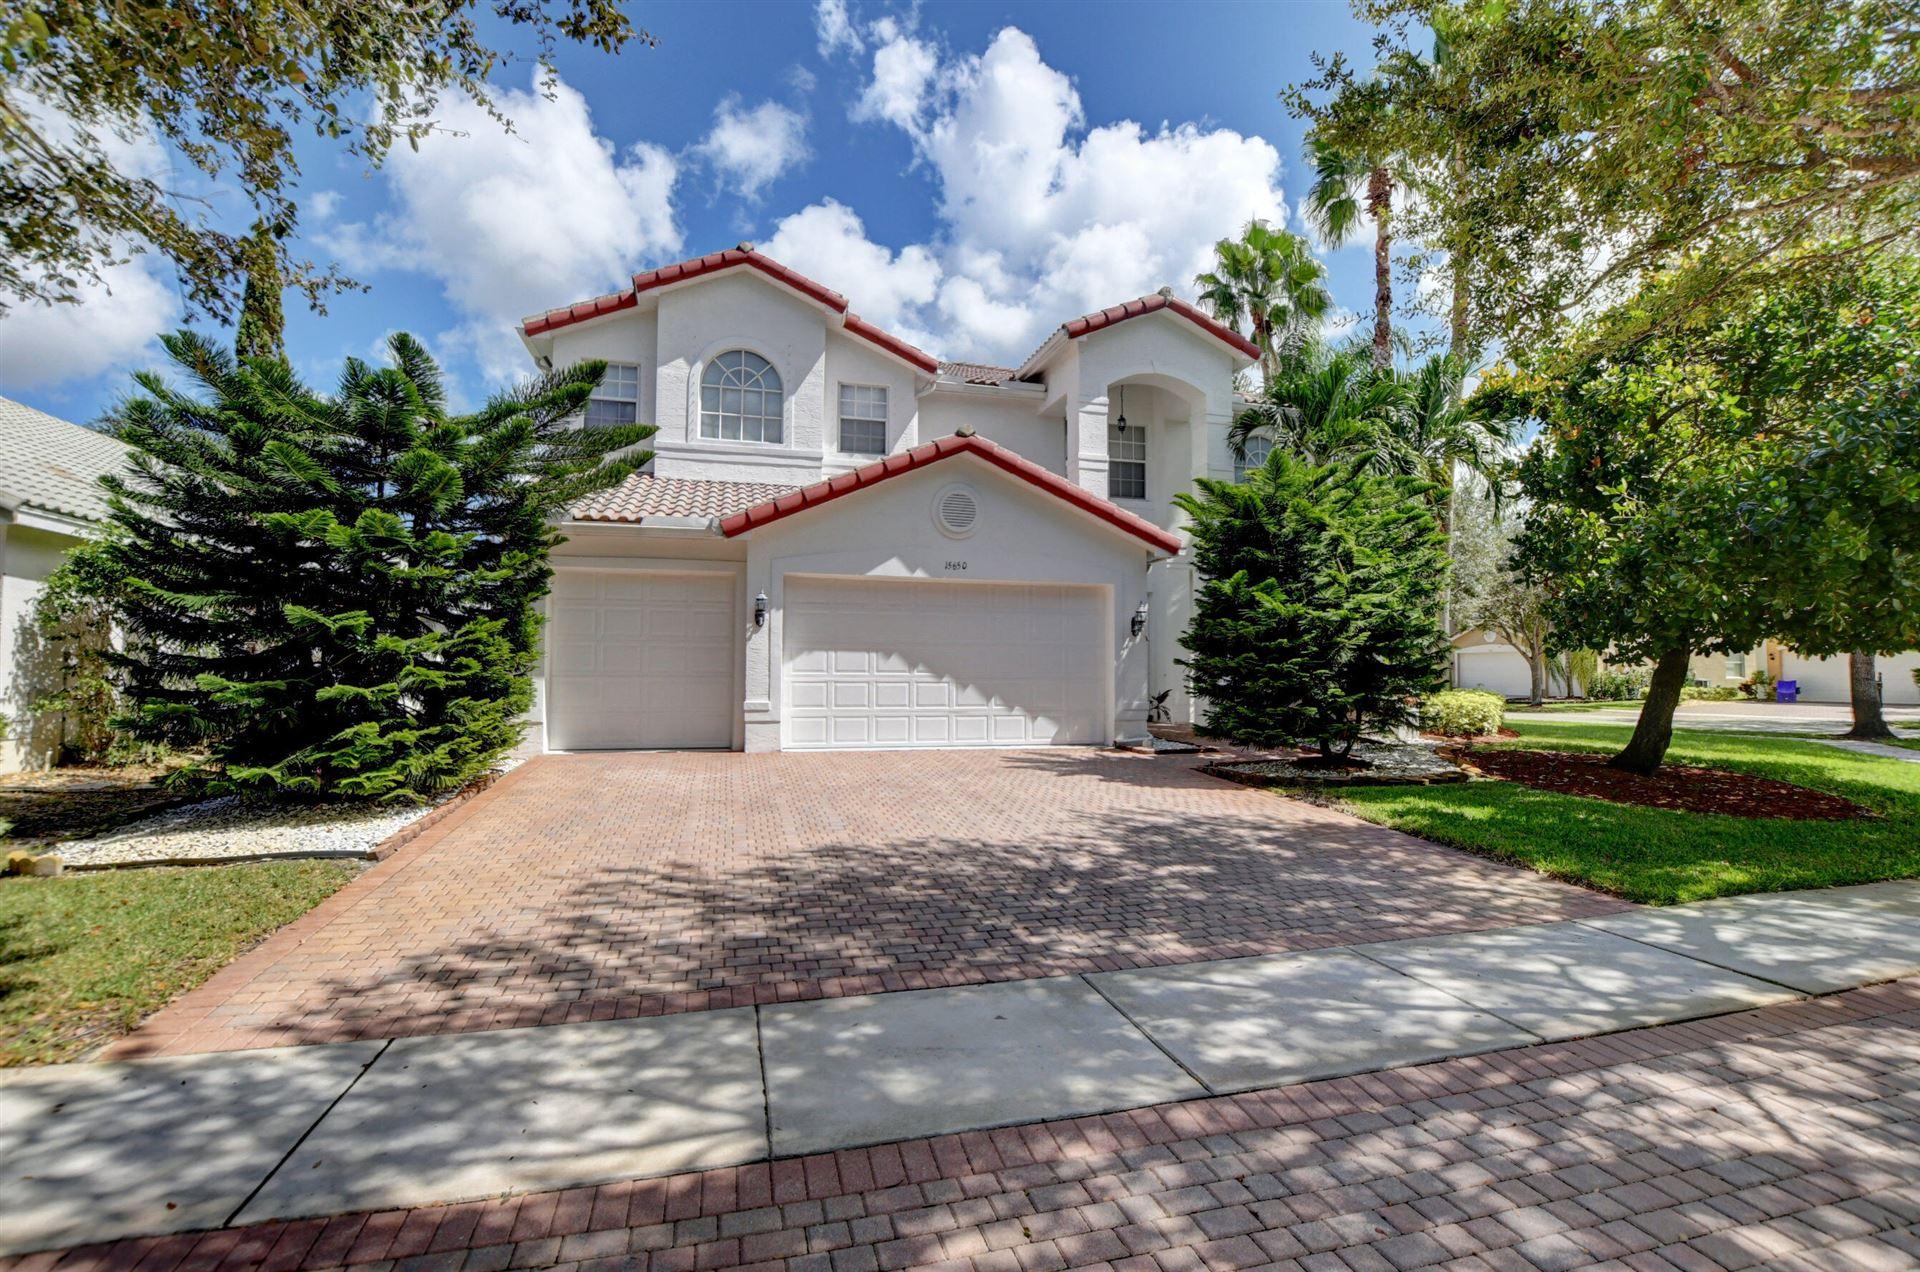 15650 Messina Isle Court, Delray Beach, FL 33446 - #: RX-10750472